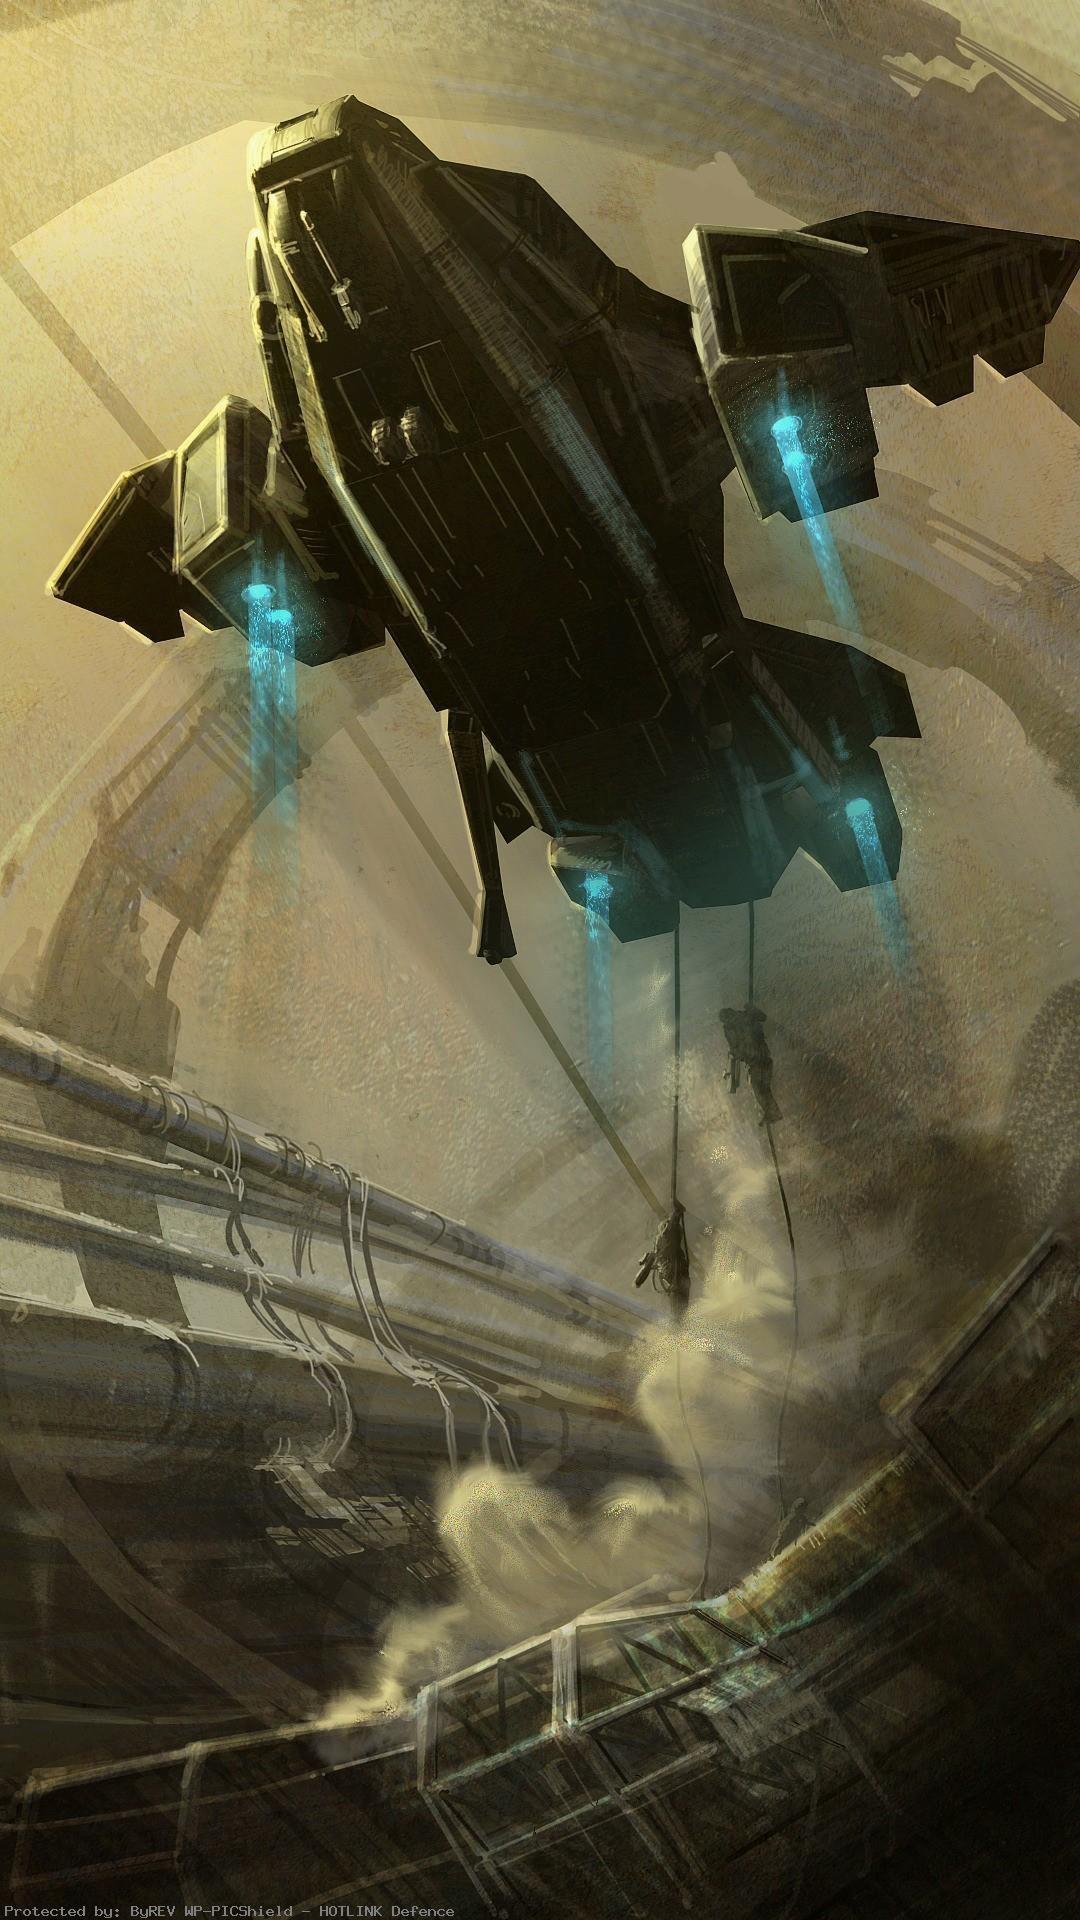 Artwork-liftoff-space-elevator-pelican-sandstorms-unsc-1080×1920-